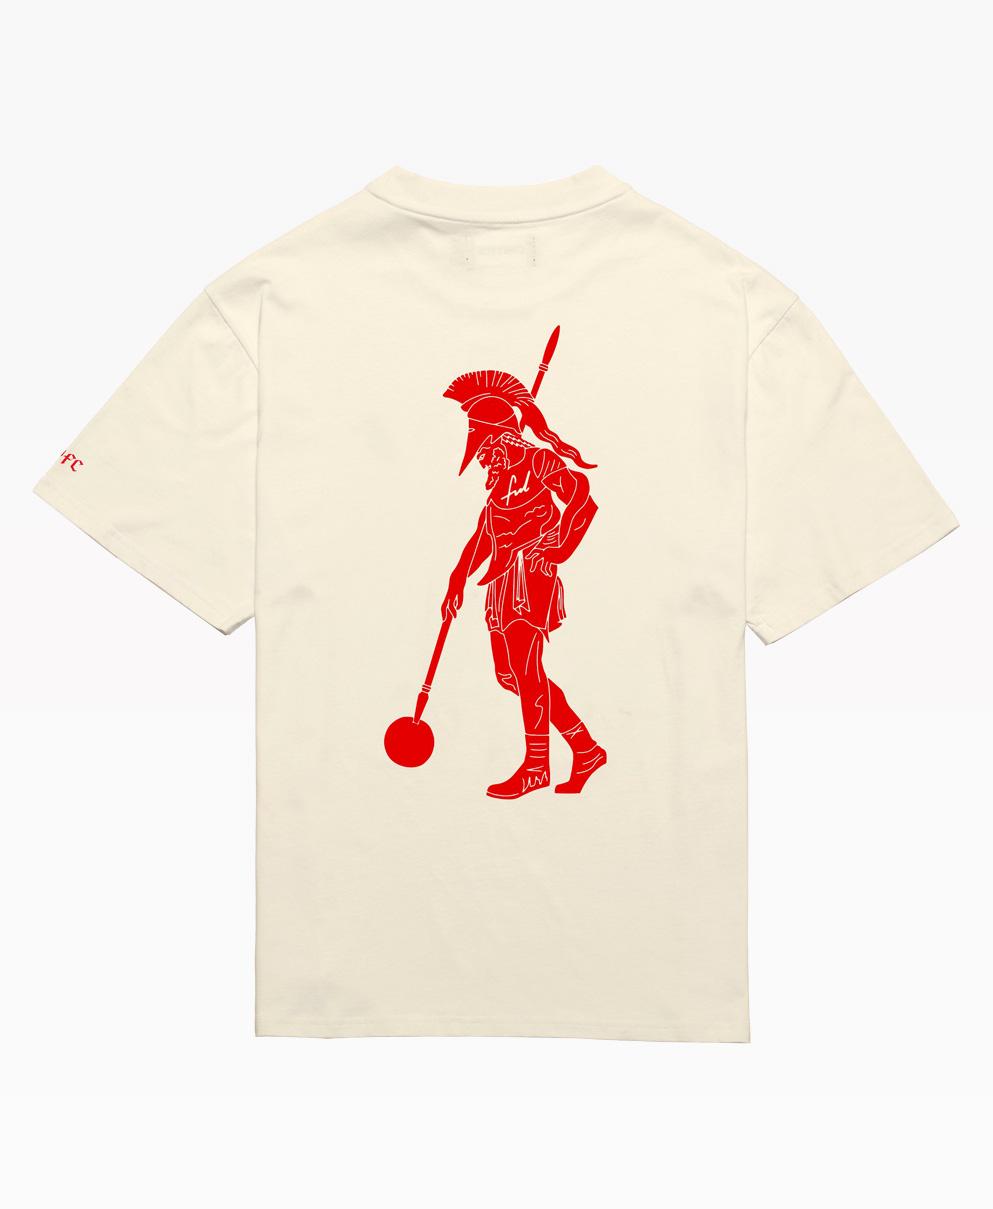 Chrystie Swfc Fnl Warrior T Shirt : Cream Back